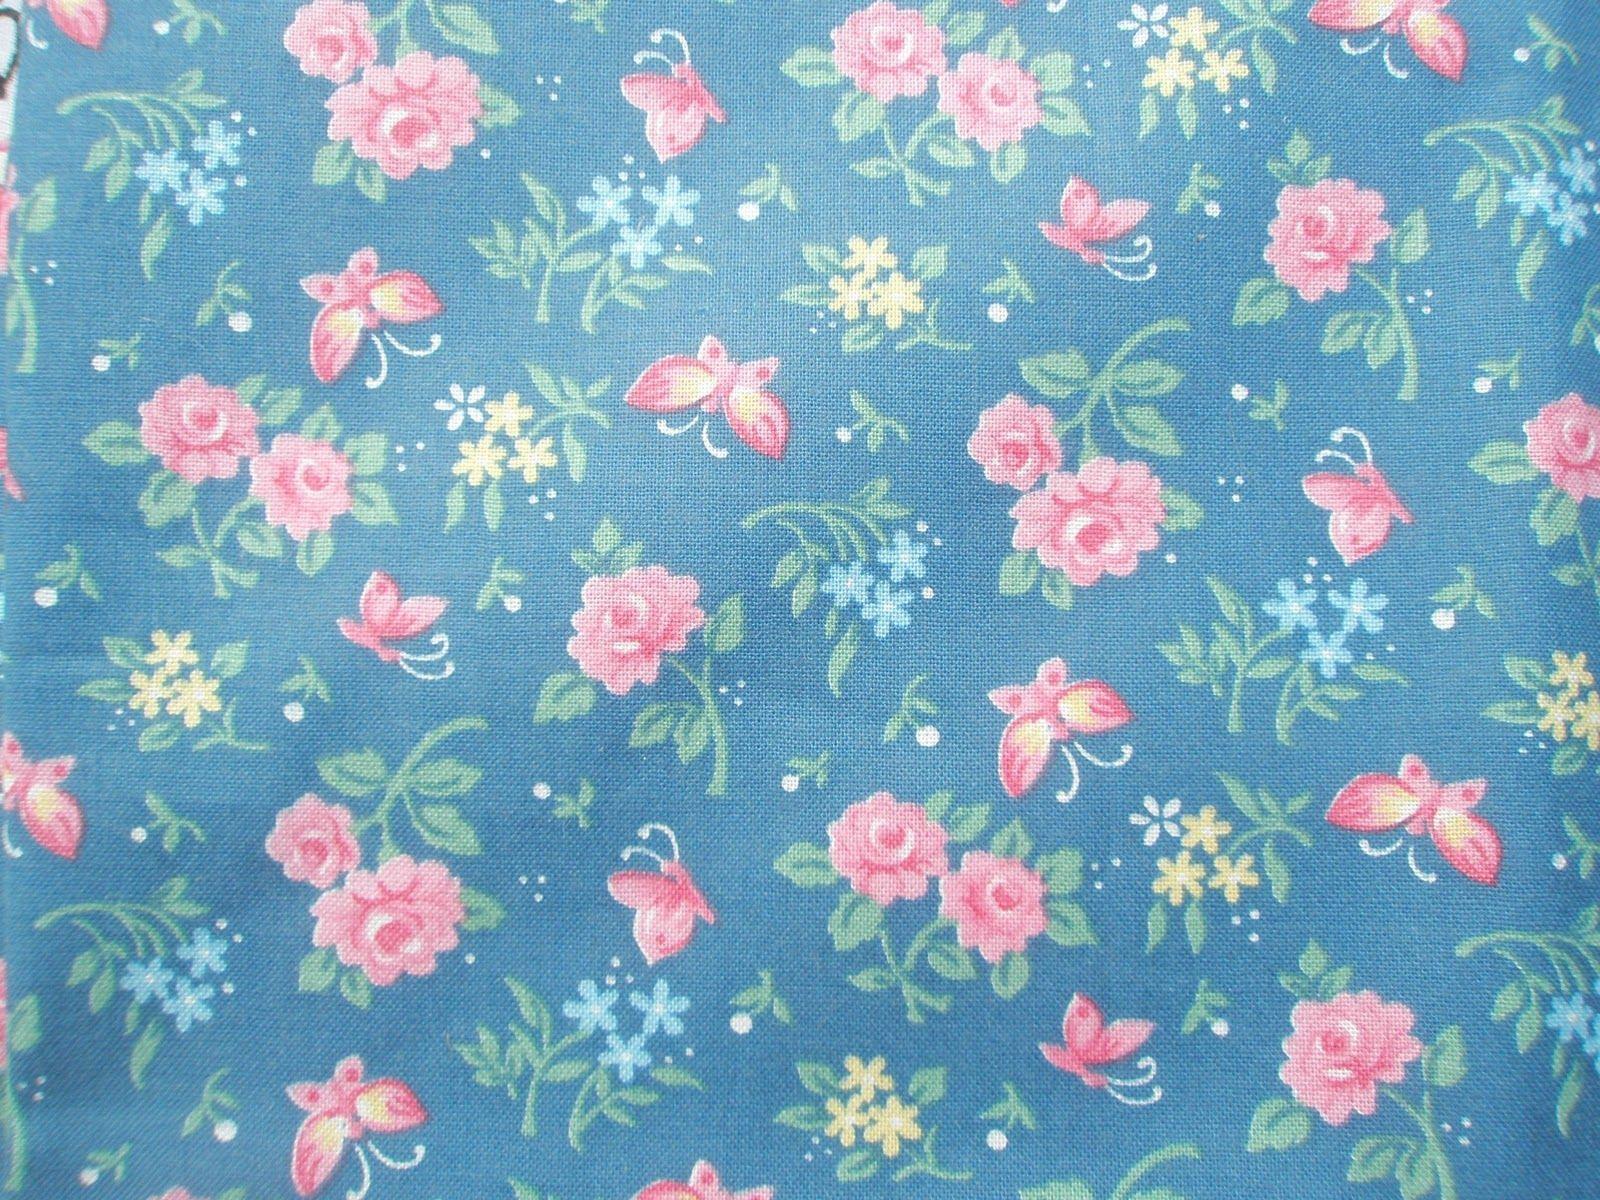 Tumblr Design Wallpapers Top Free Tumblr Design Backgrounds Wallpaperaccess